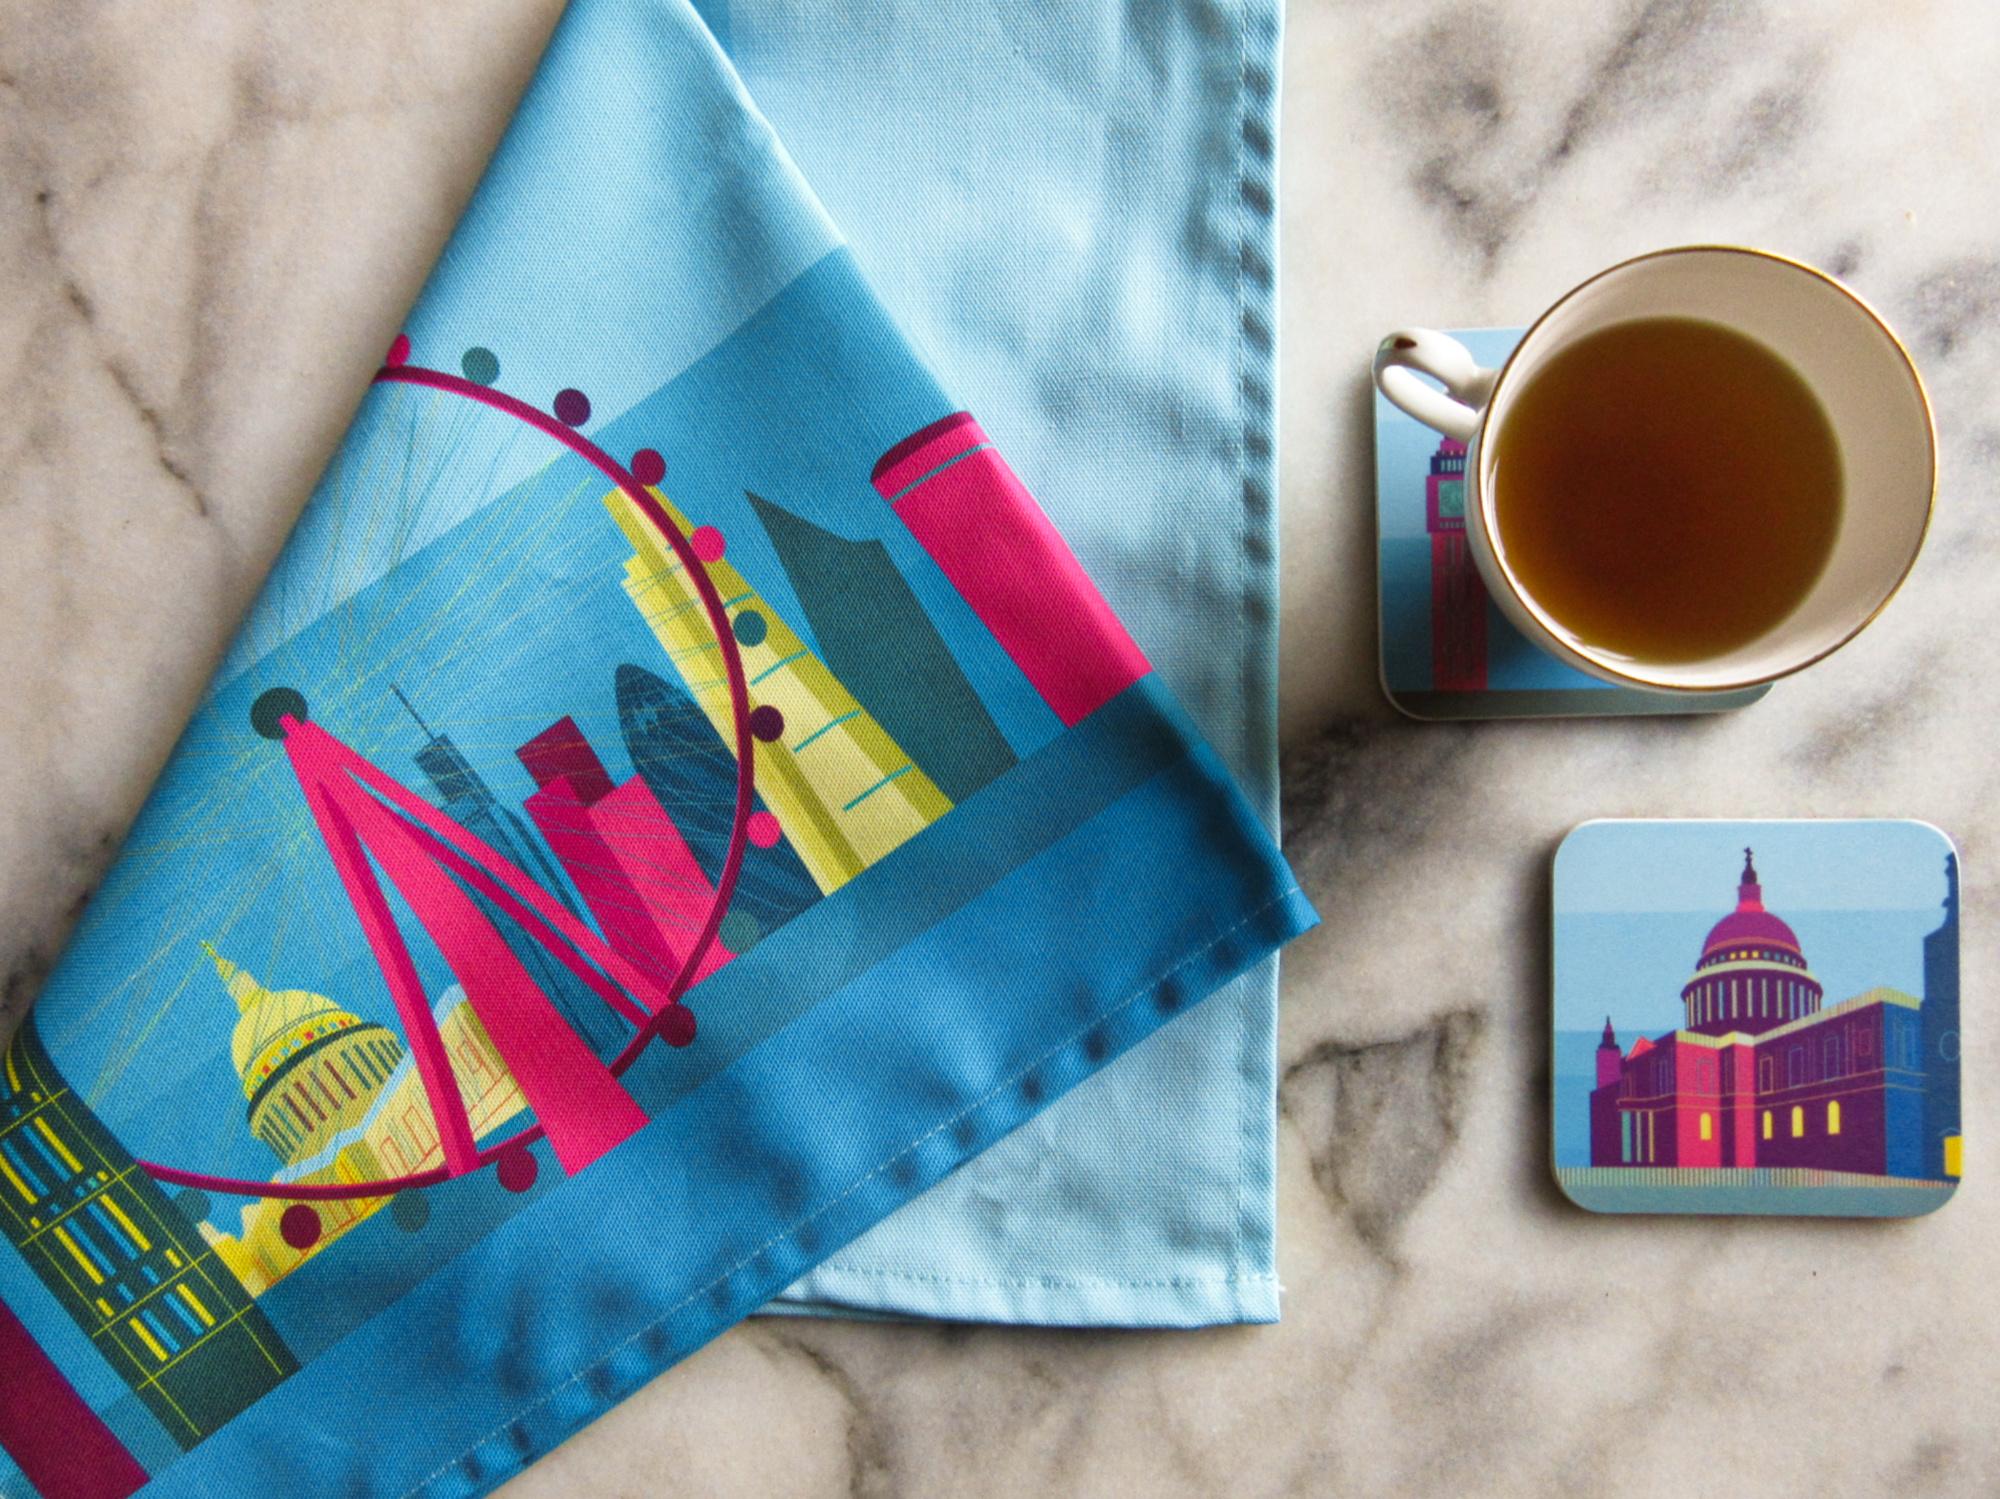 South-Island-Art-London-Skyline-Tea-Towel-Coaster.jpg